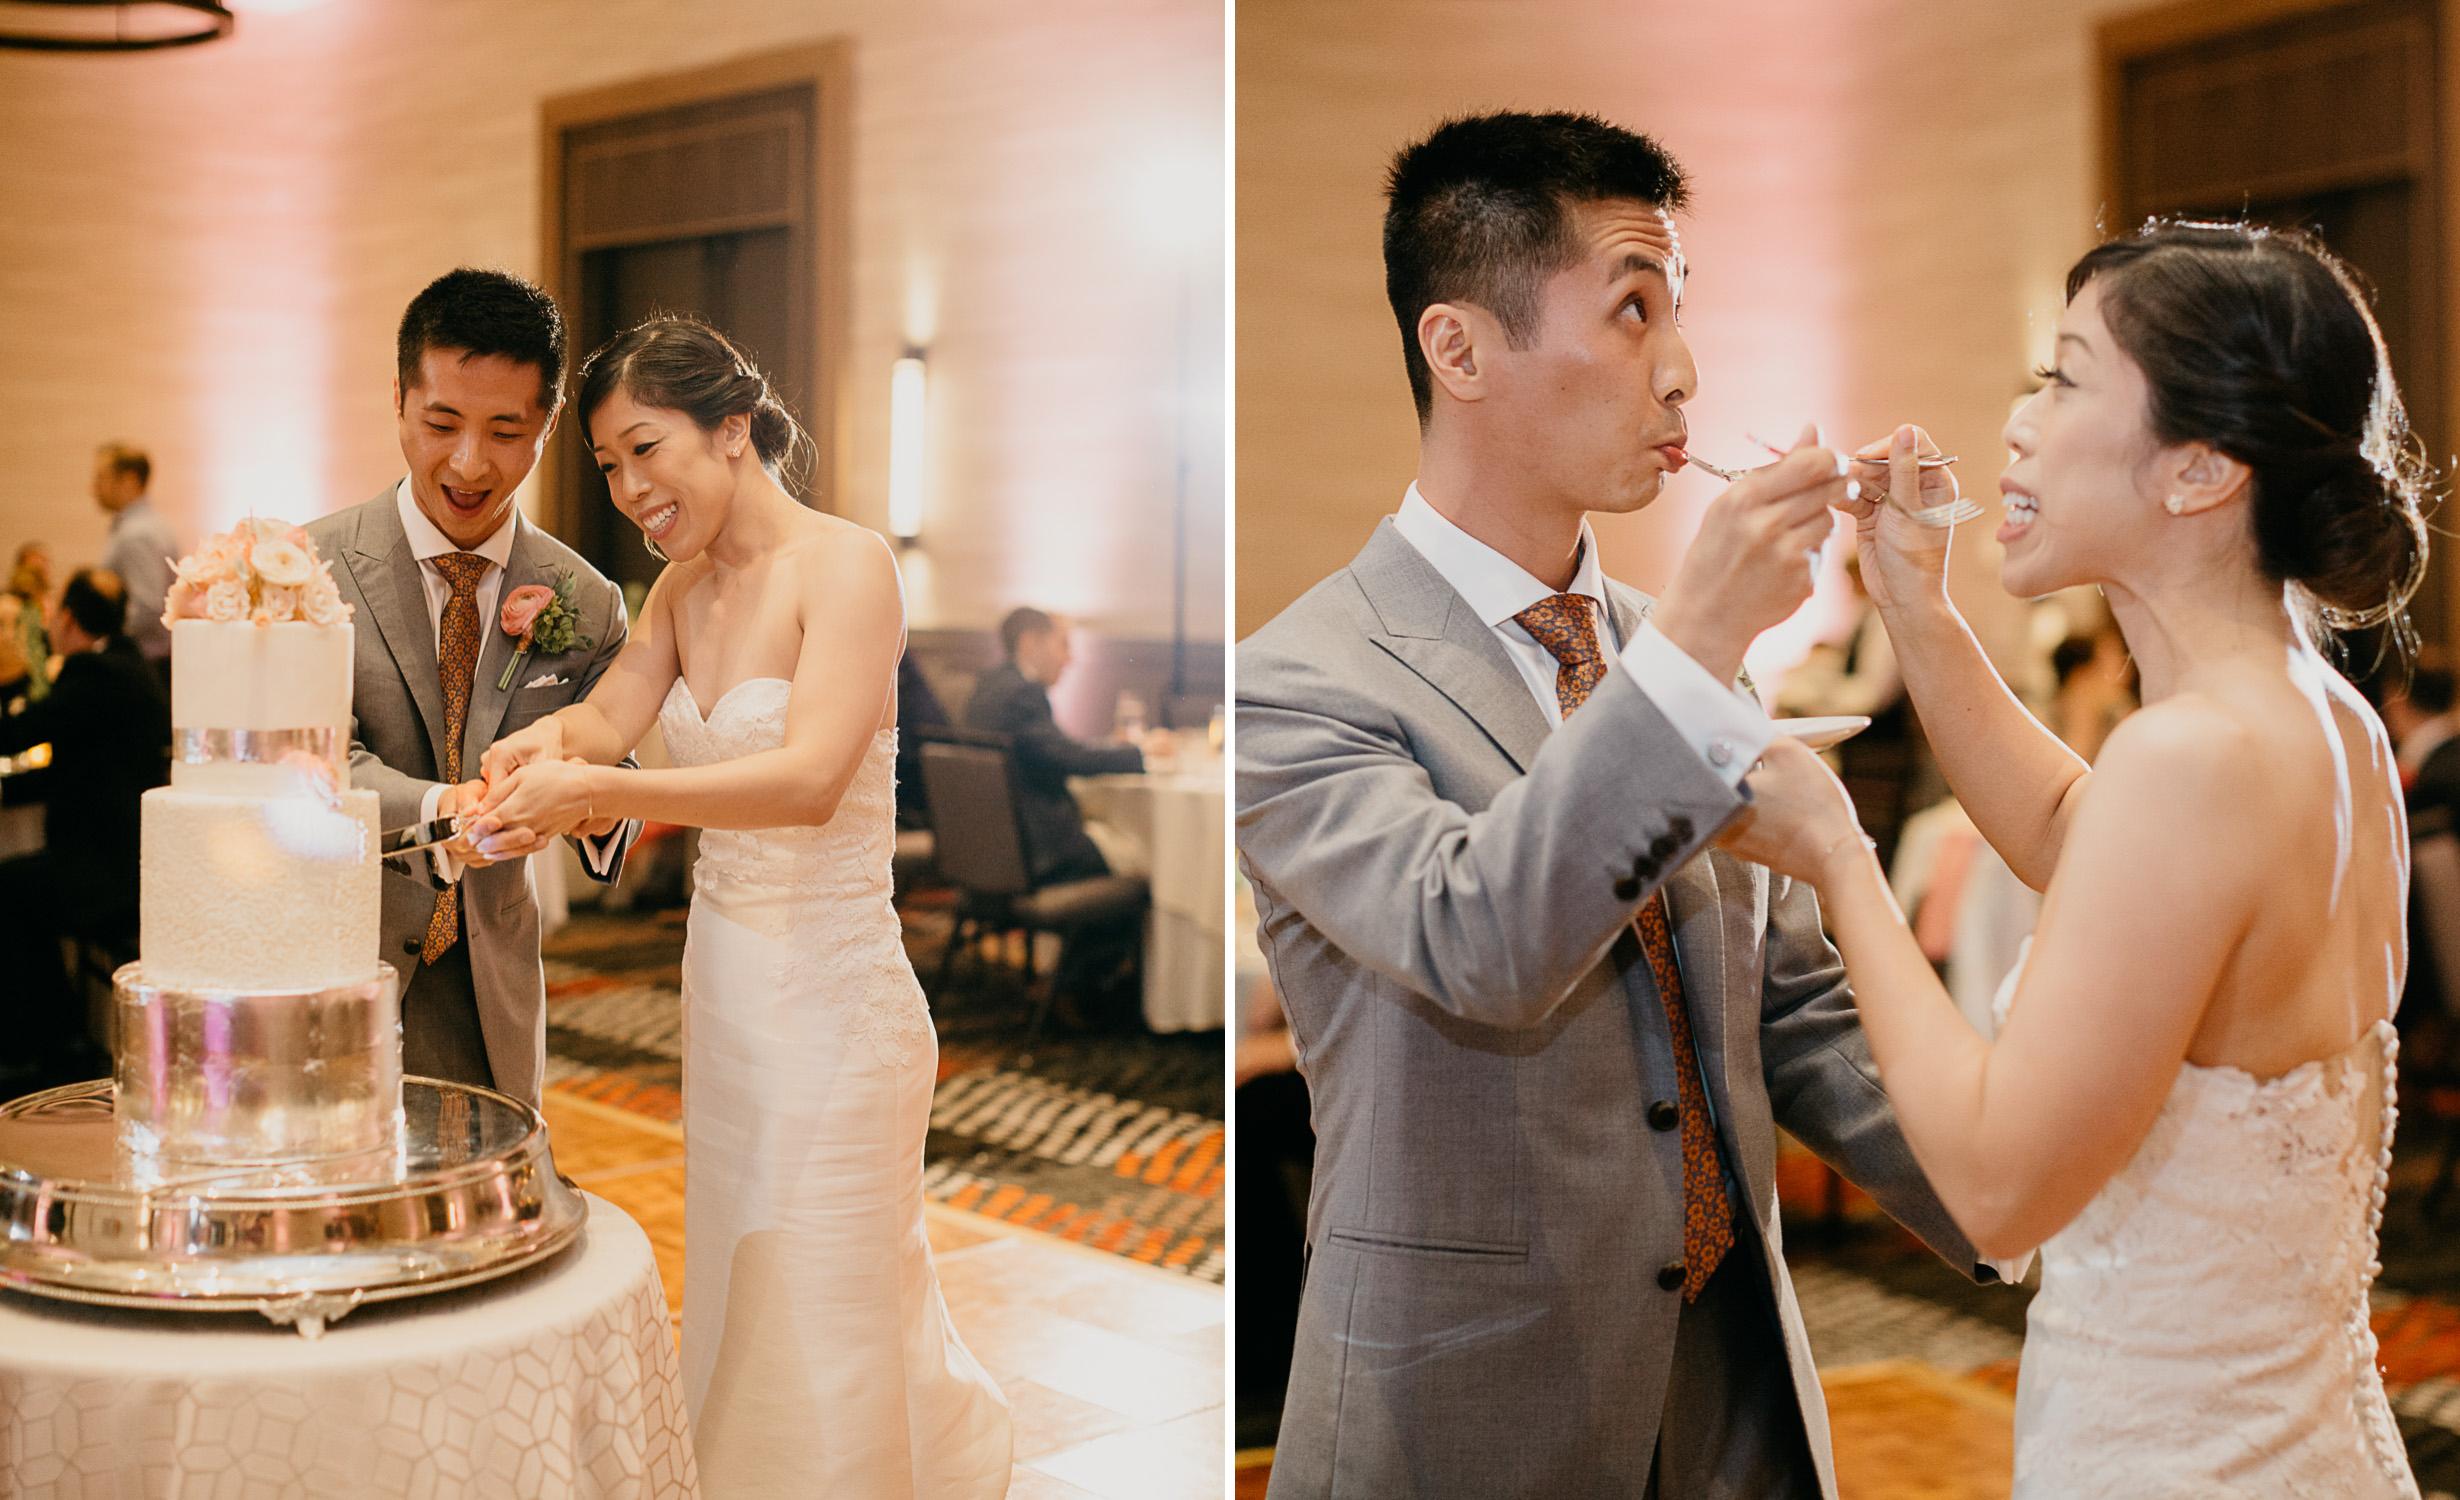 Mindy_Bo_Boston_Wedding_MIT_HotelCommonwealth_031.jpg